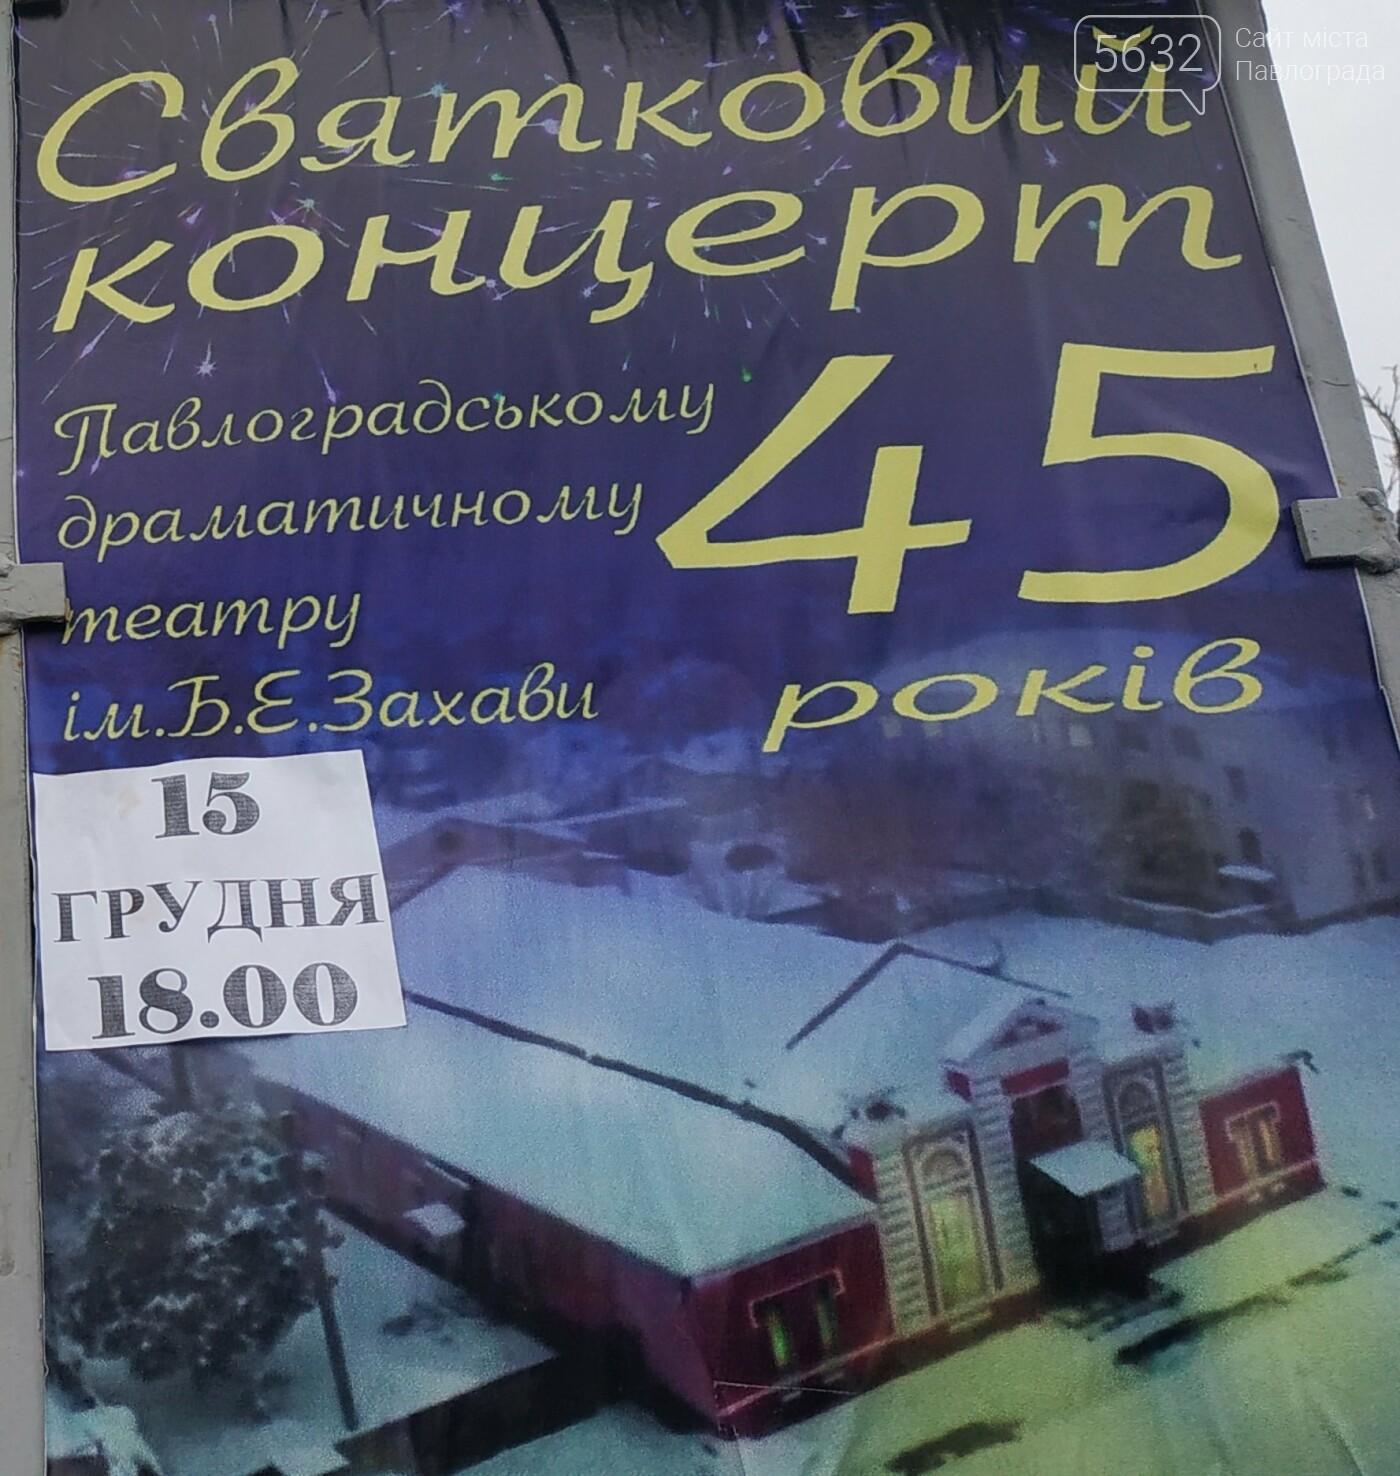 Павлоградский драматический театр им. Б. Е. Захавы отмечает 45-летний юбилей, фото-1